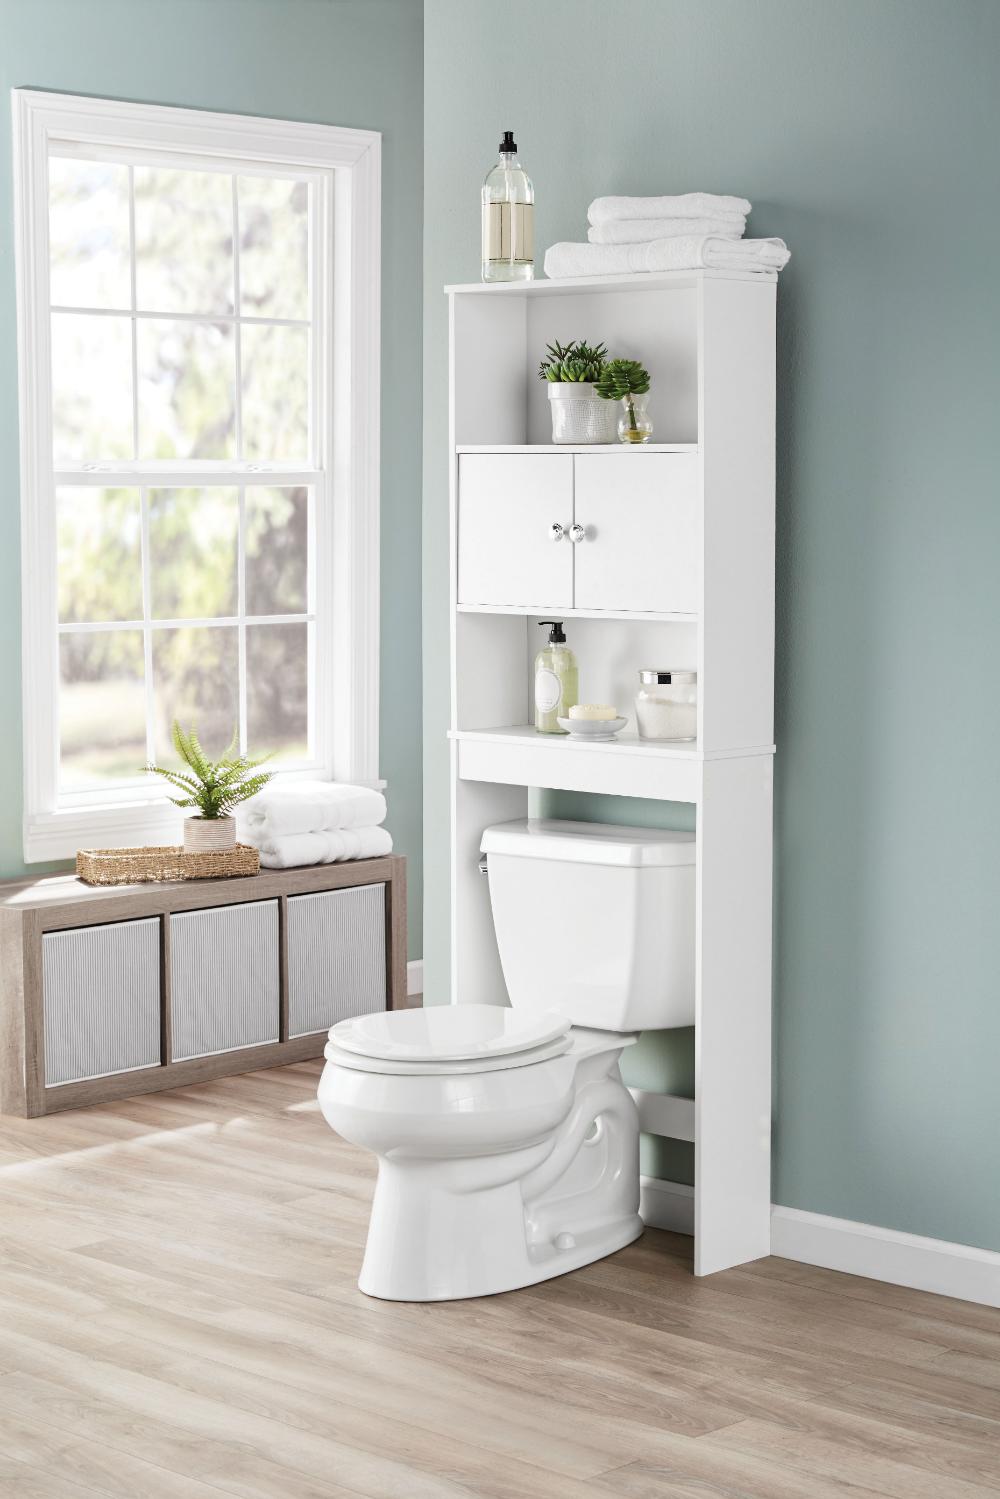 Home White Bathroom Storage Bathroom Space Saver Toilet Storage